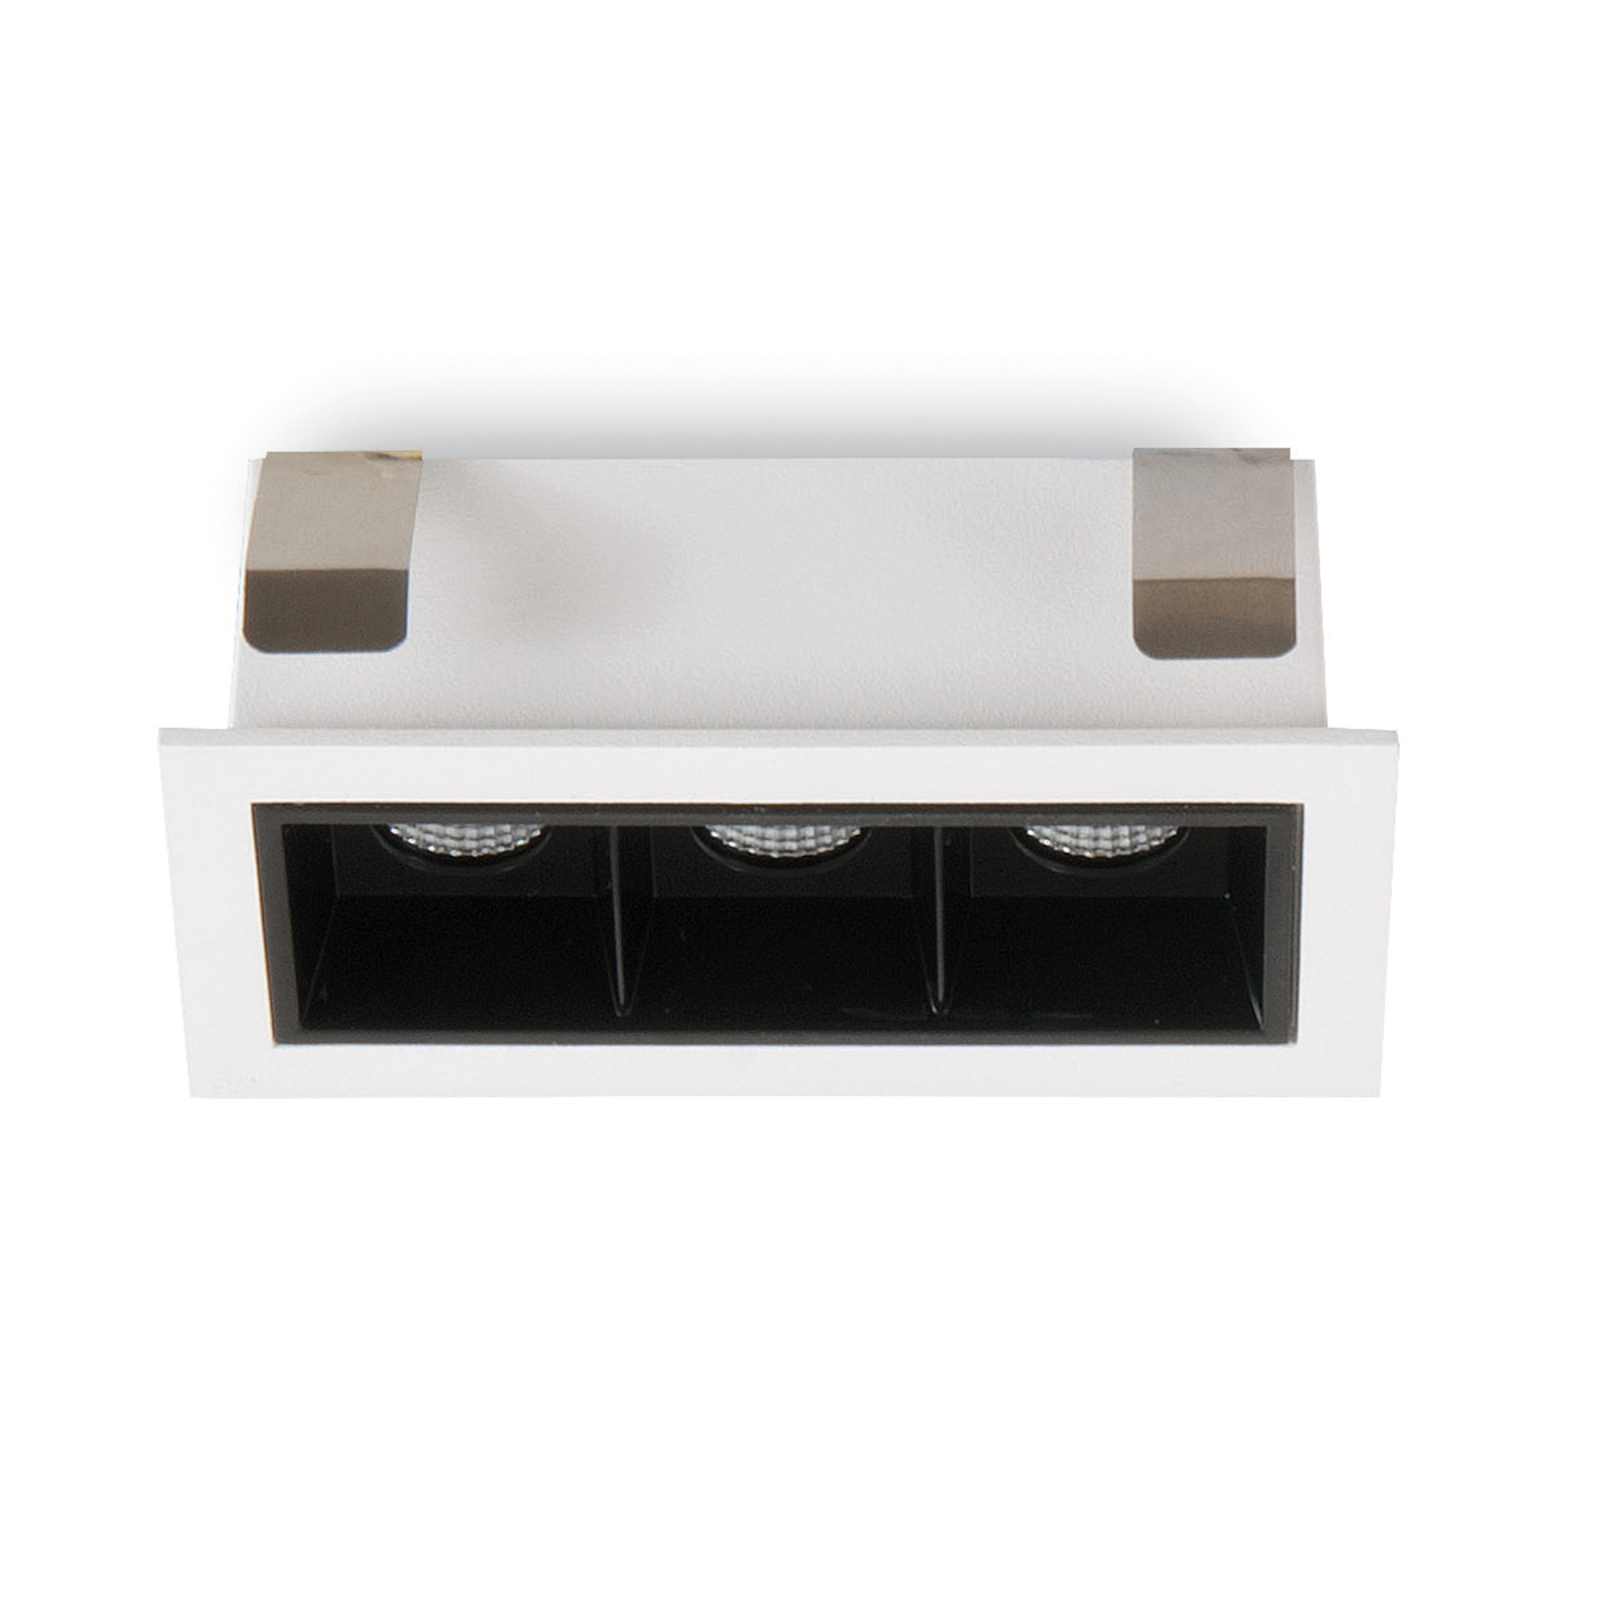 Spot LED incasso Sound 3 30° con telaio bianco